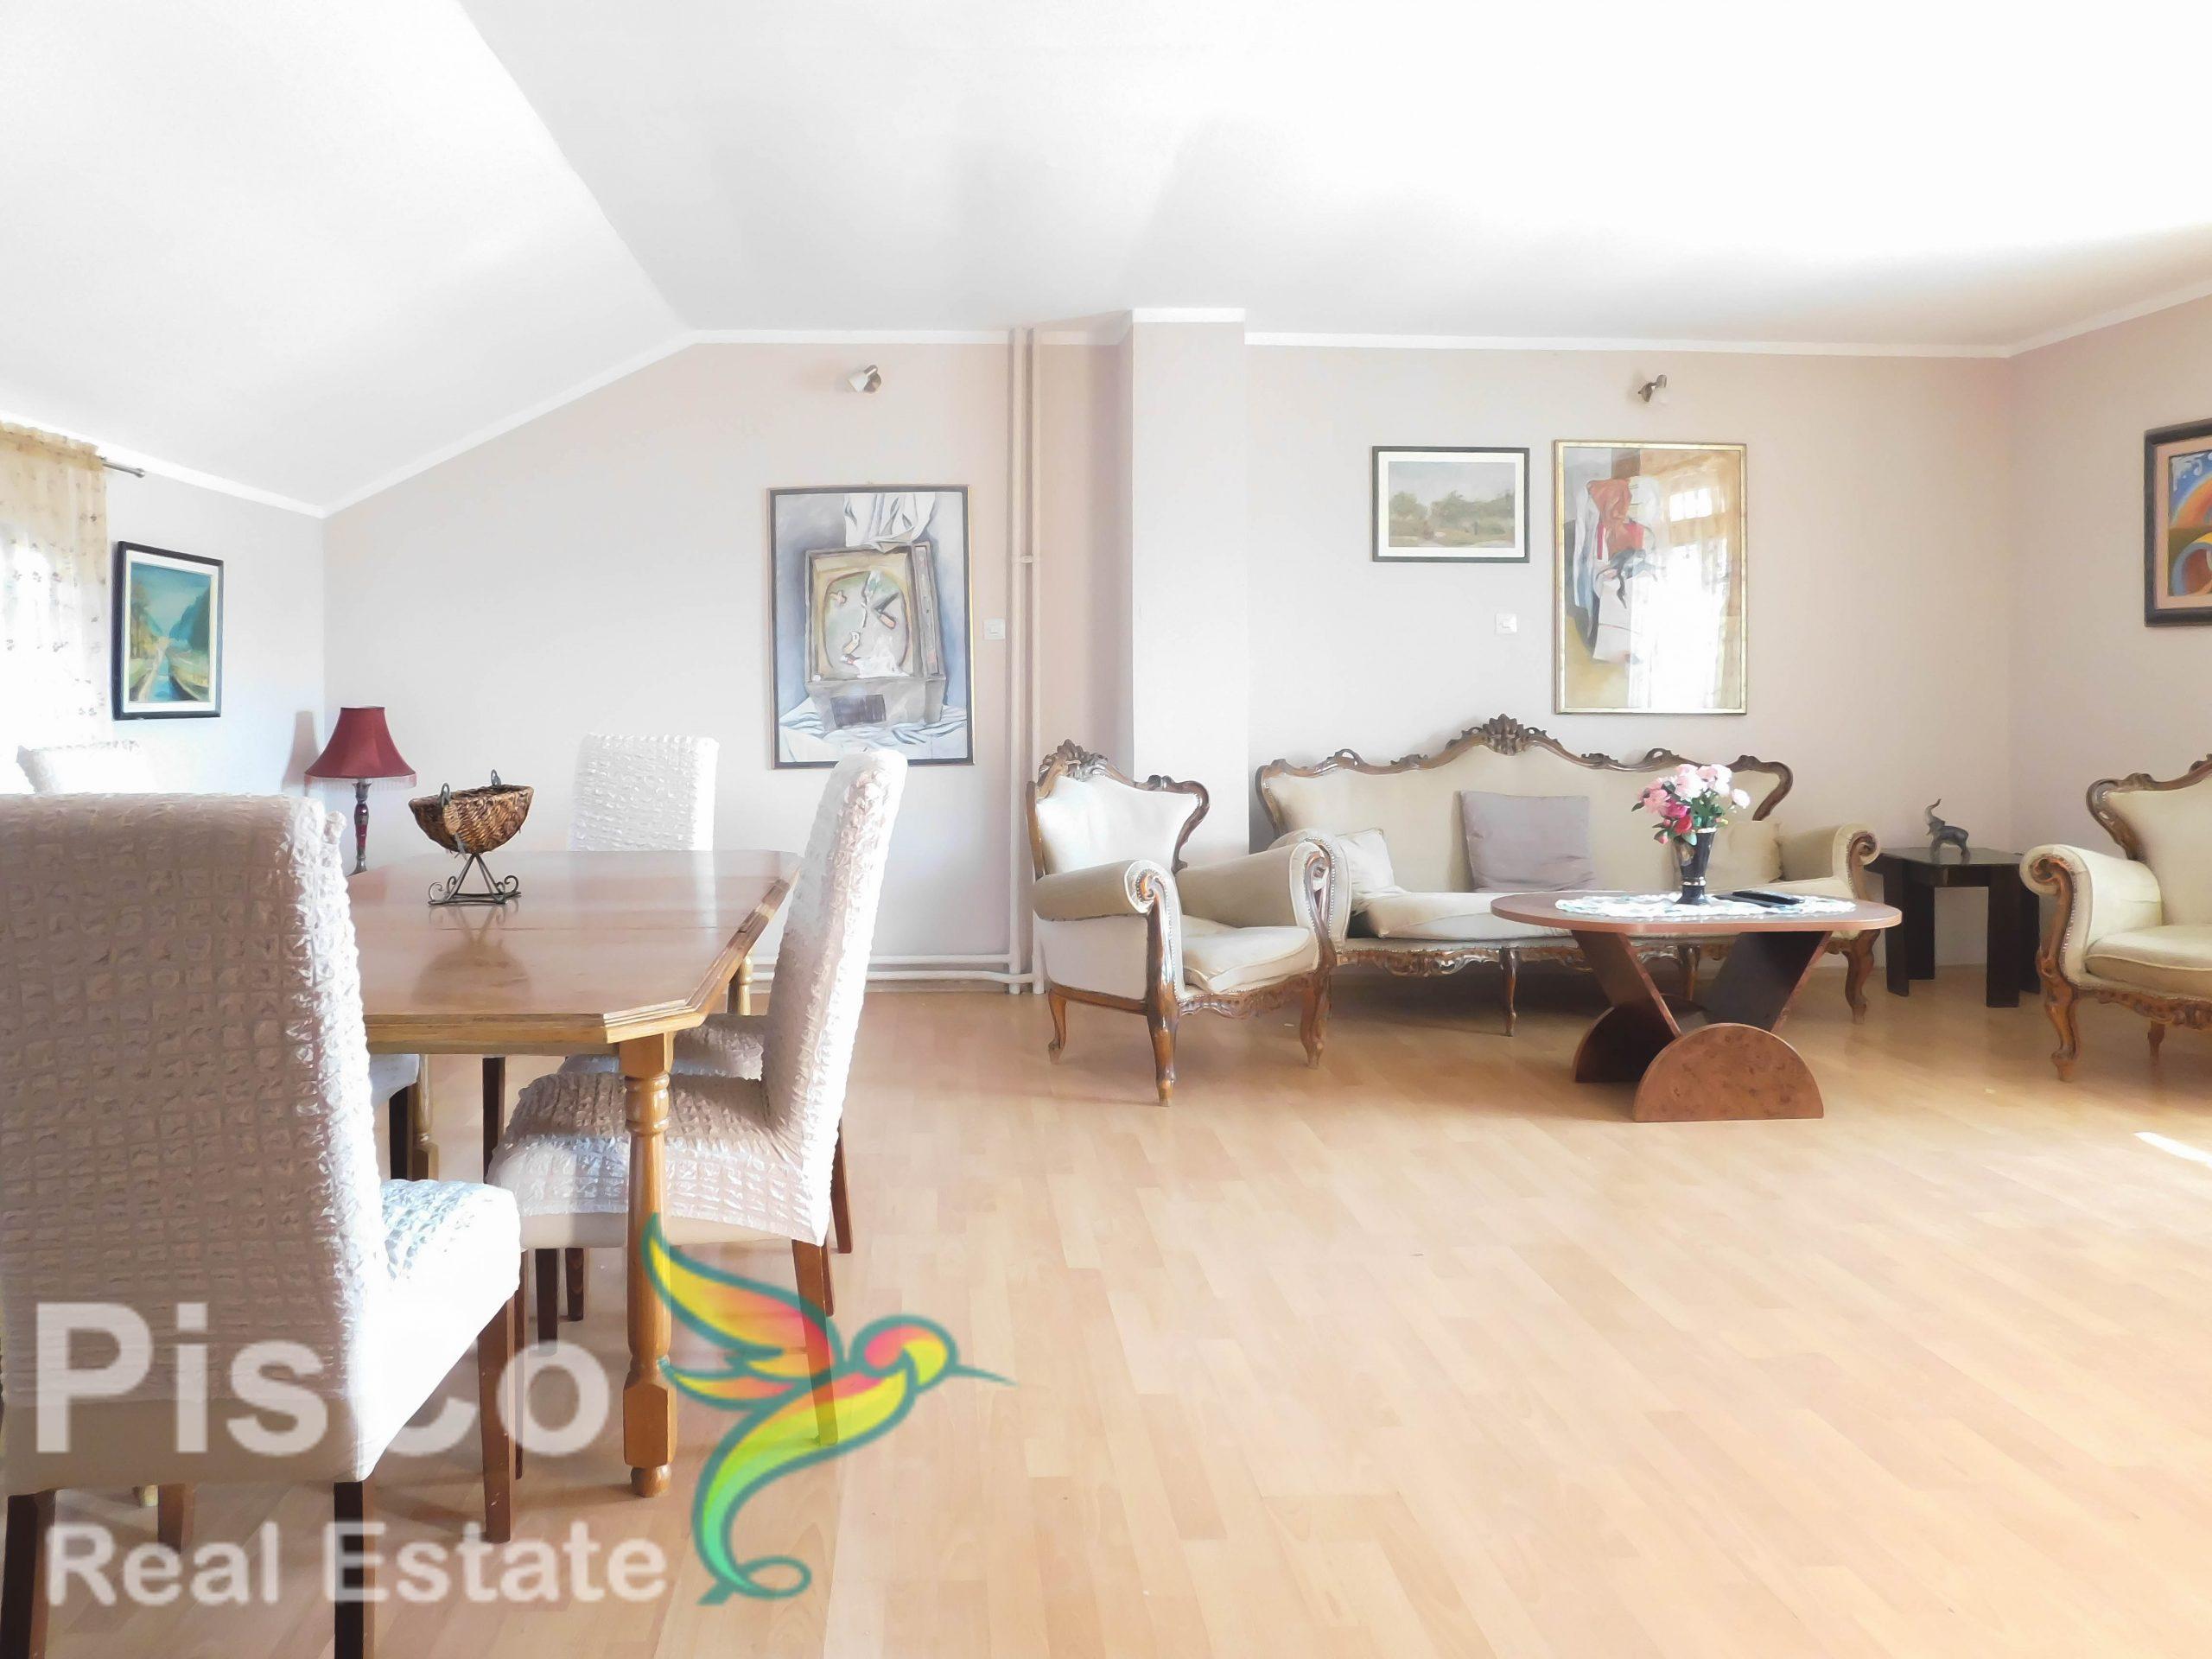 FOR RENT A three bedroom apartmen for rent in Tološi | Podgorica